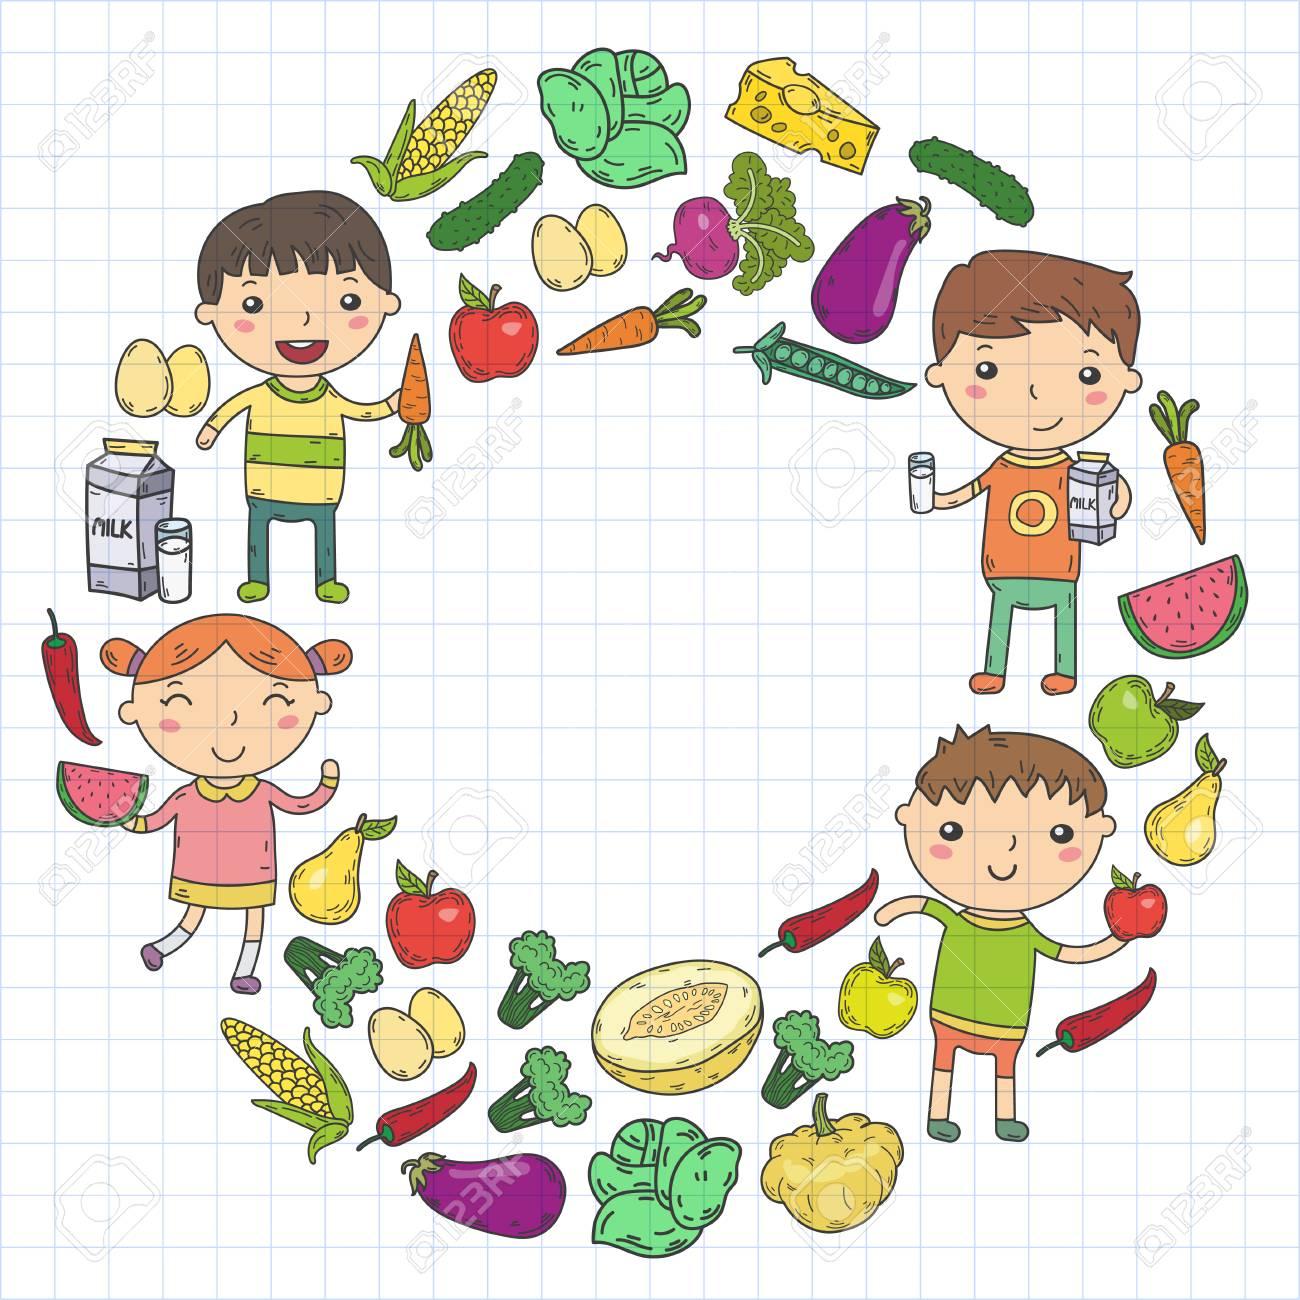 Healthy Food In Circle With Kindergarten Kids Vector Illustration